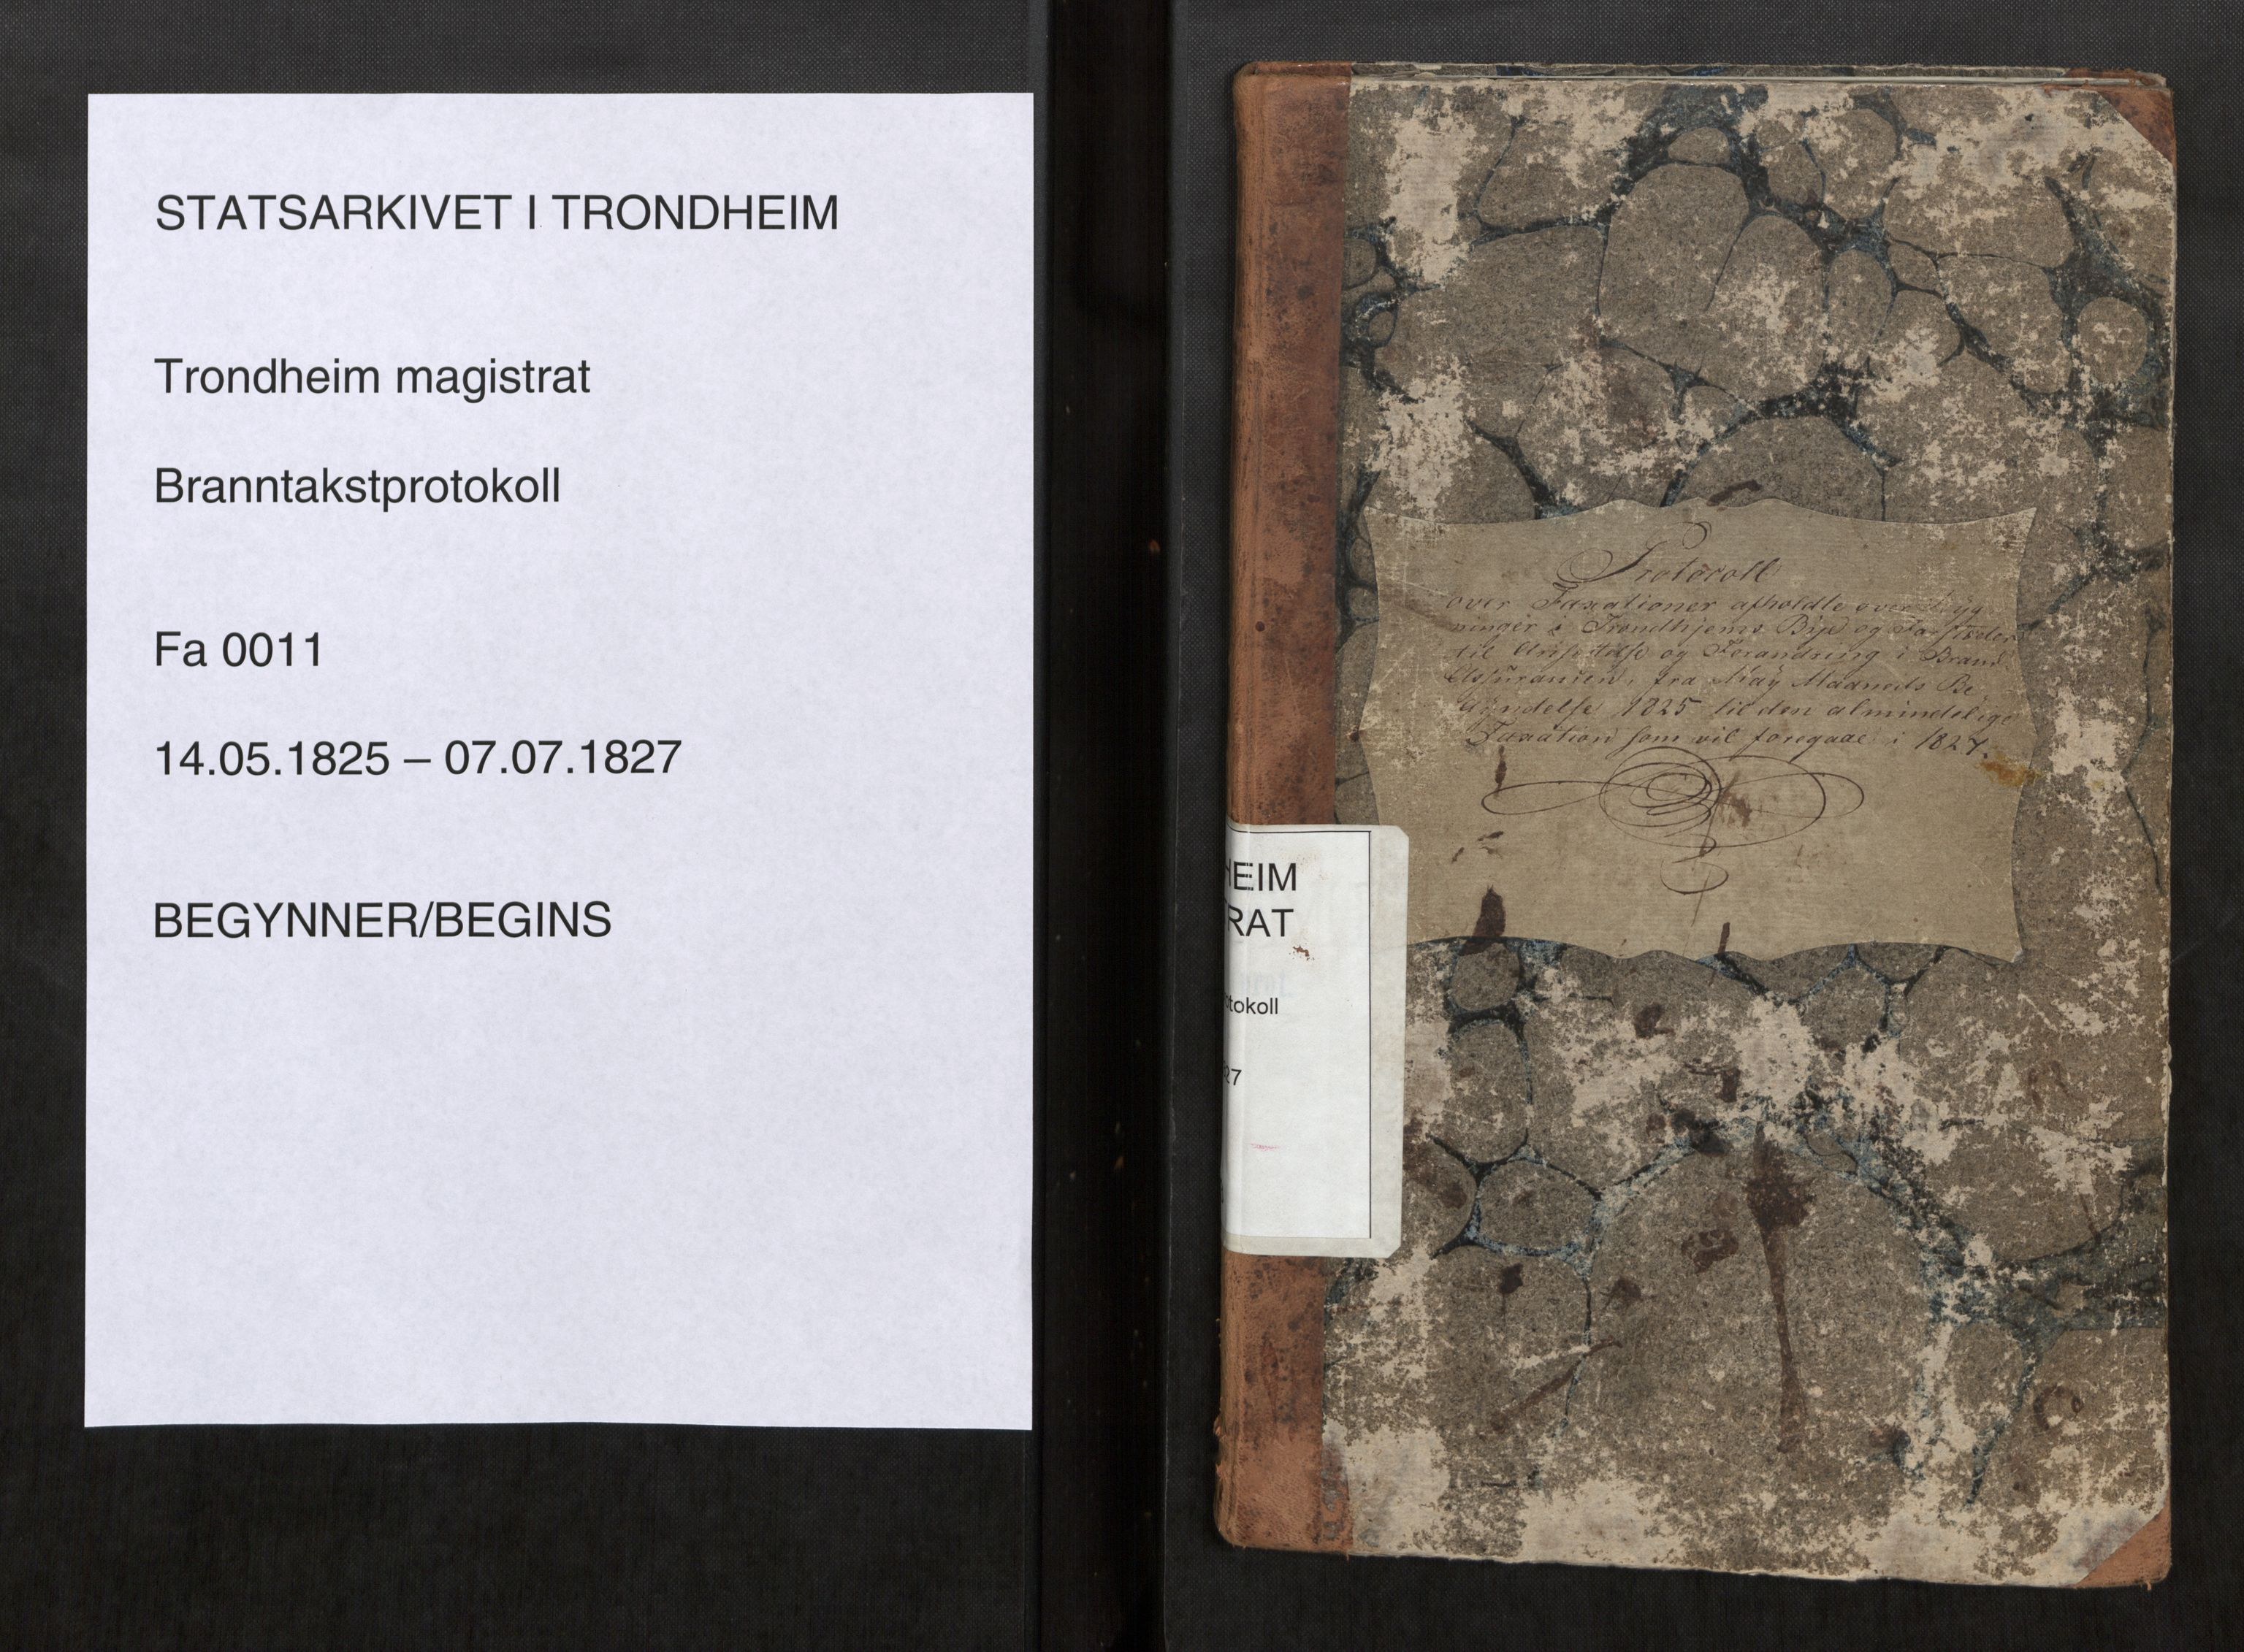 SAT, Norges Brannkasse Trondheim magistrat, Branntakstprotokoller med tekst, nr. 11: 1825-1827, 1825-1827